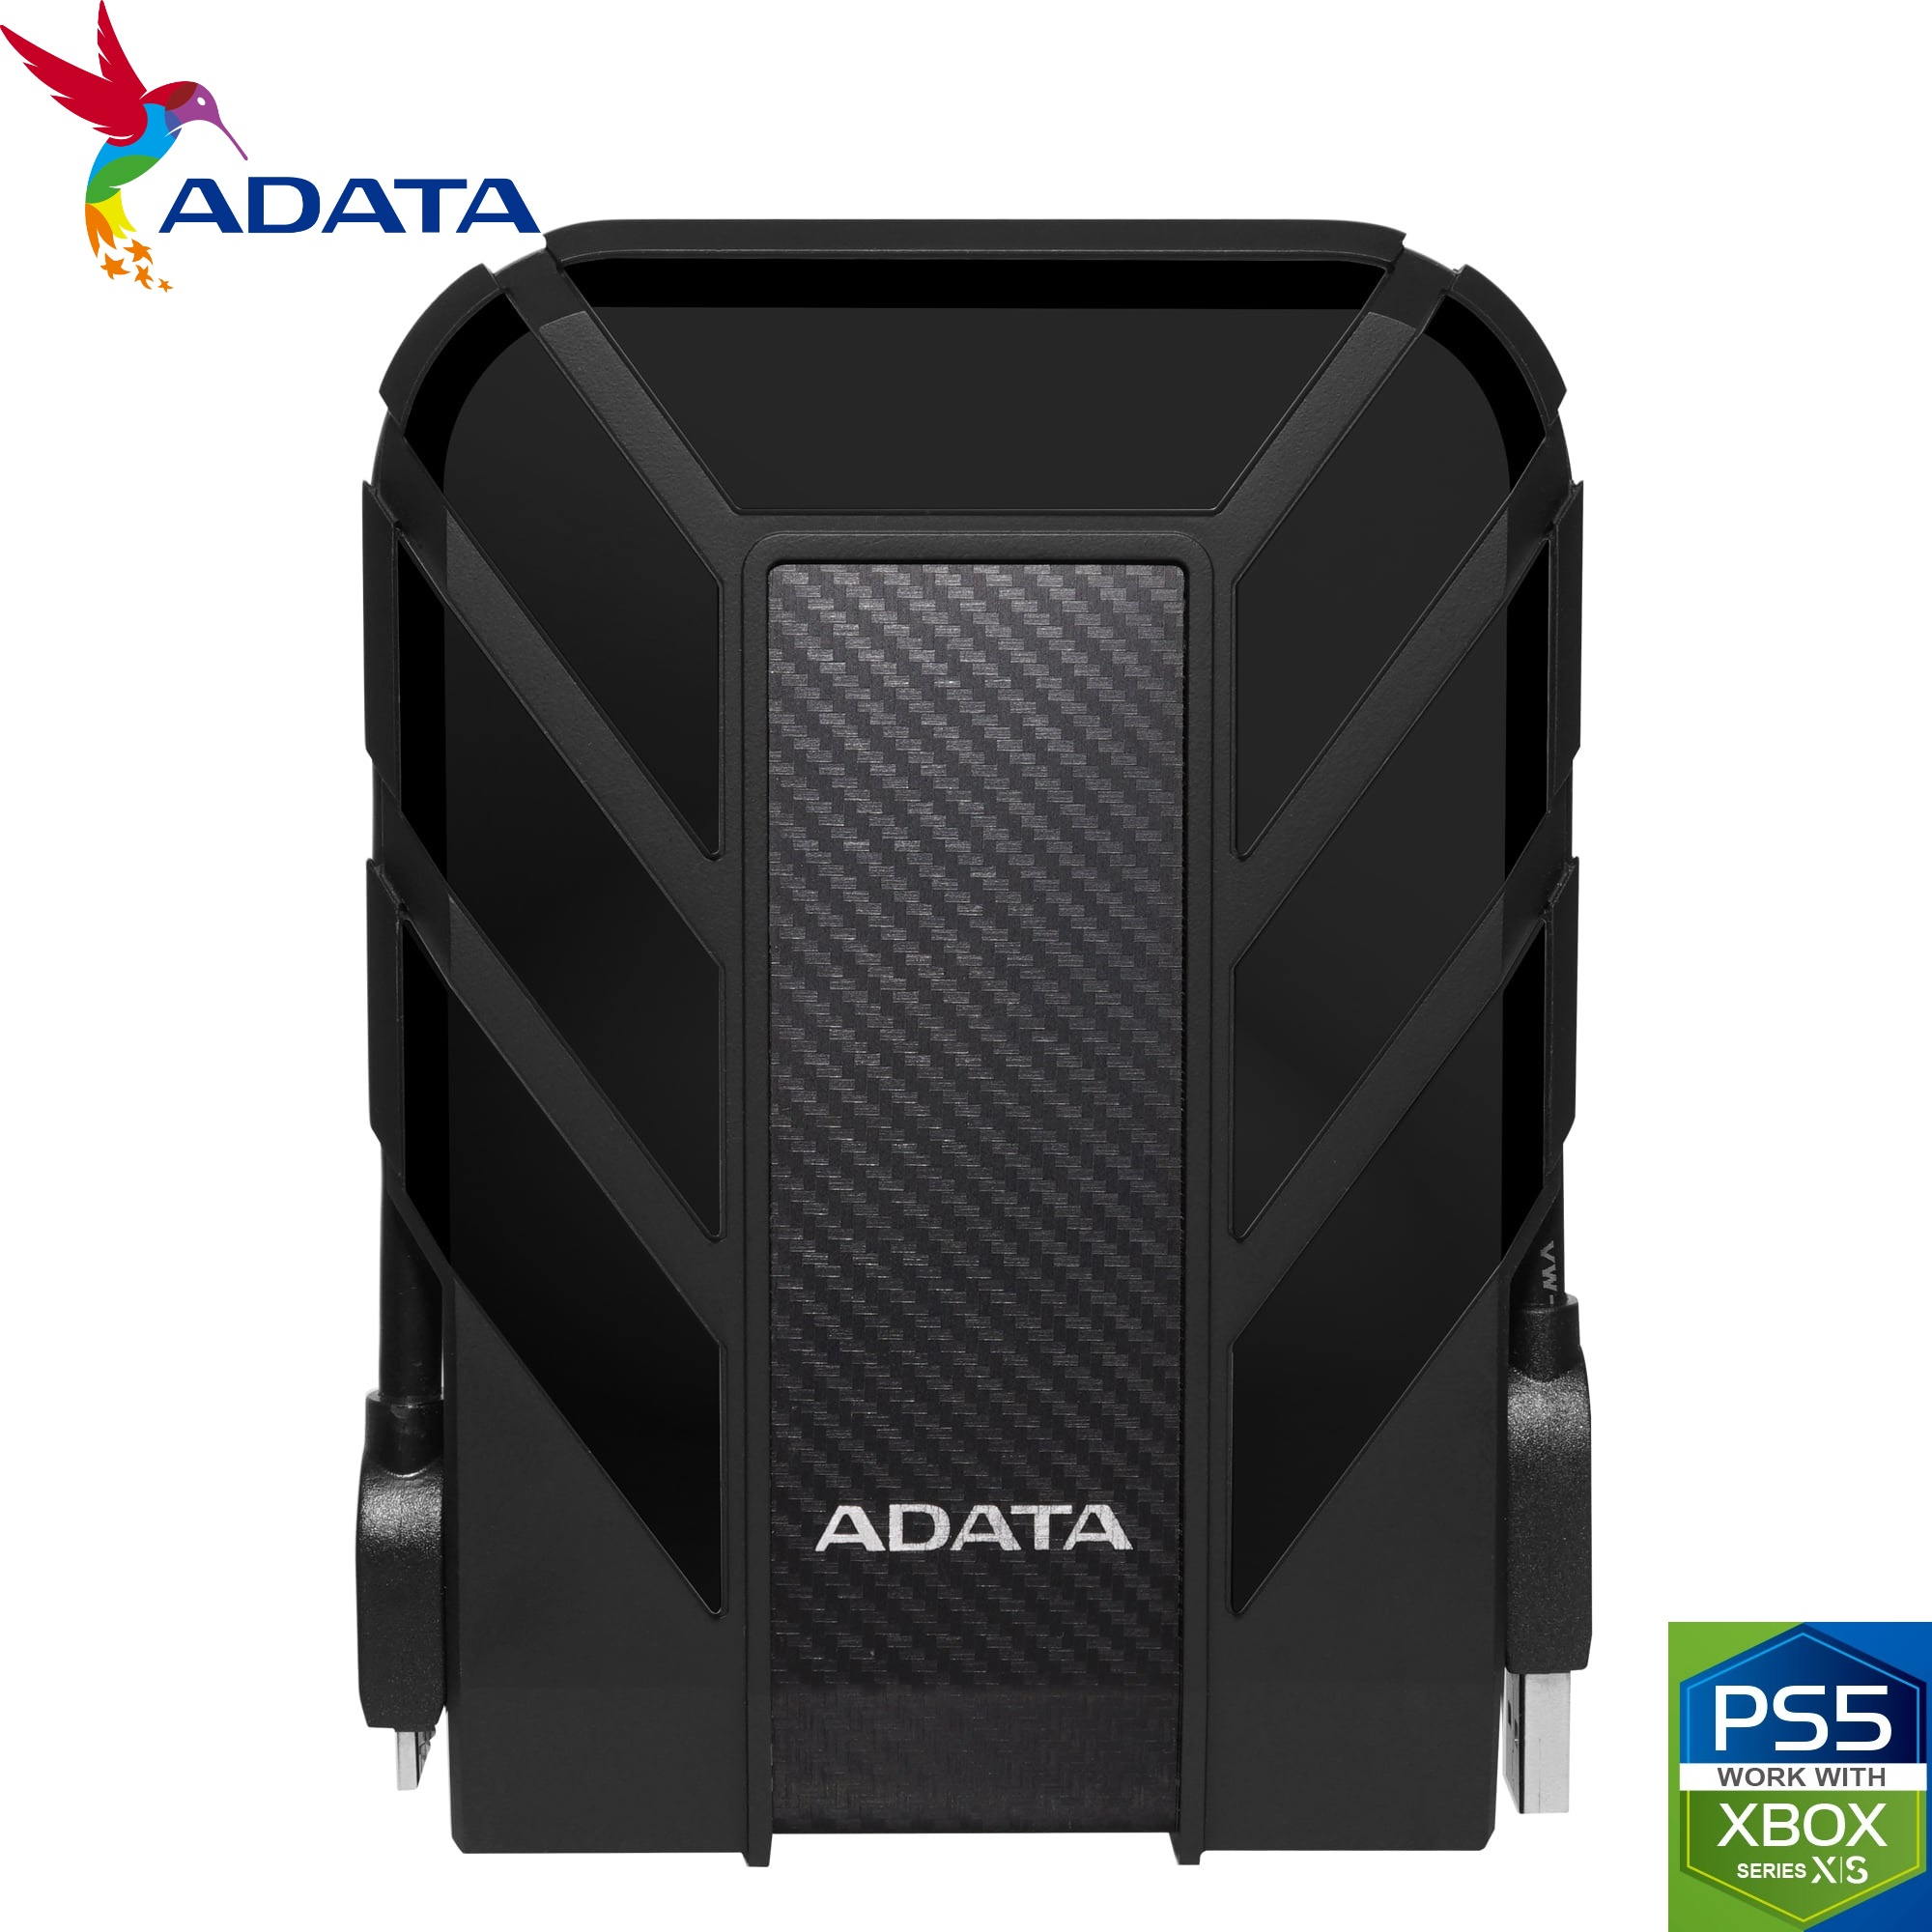 ADATA 4TB HD710 Pro USB 3.2 External Hard Drive Waterproof/Shockproof/Dustproof Ruggedized Black